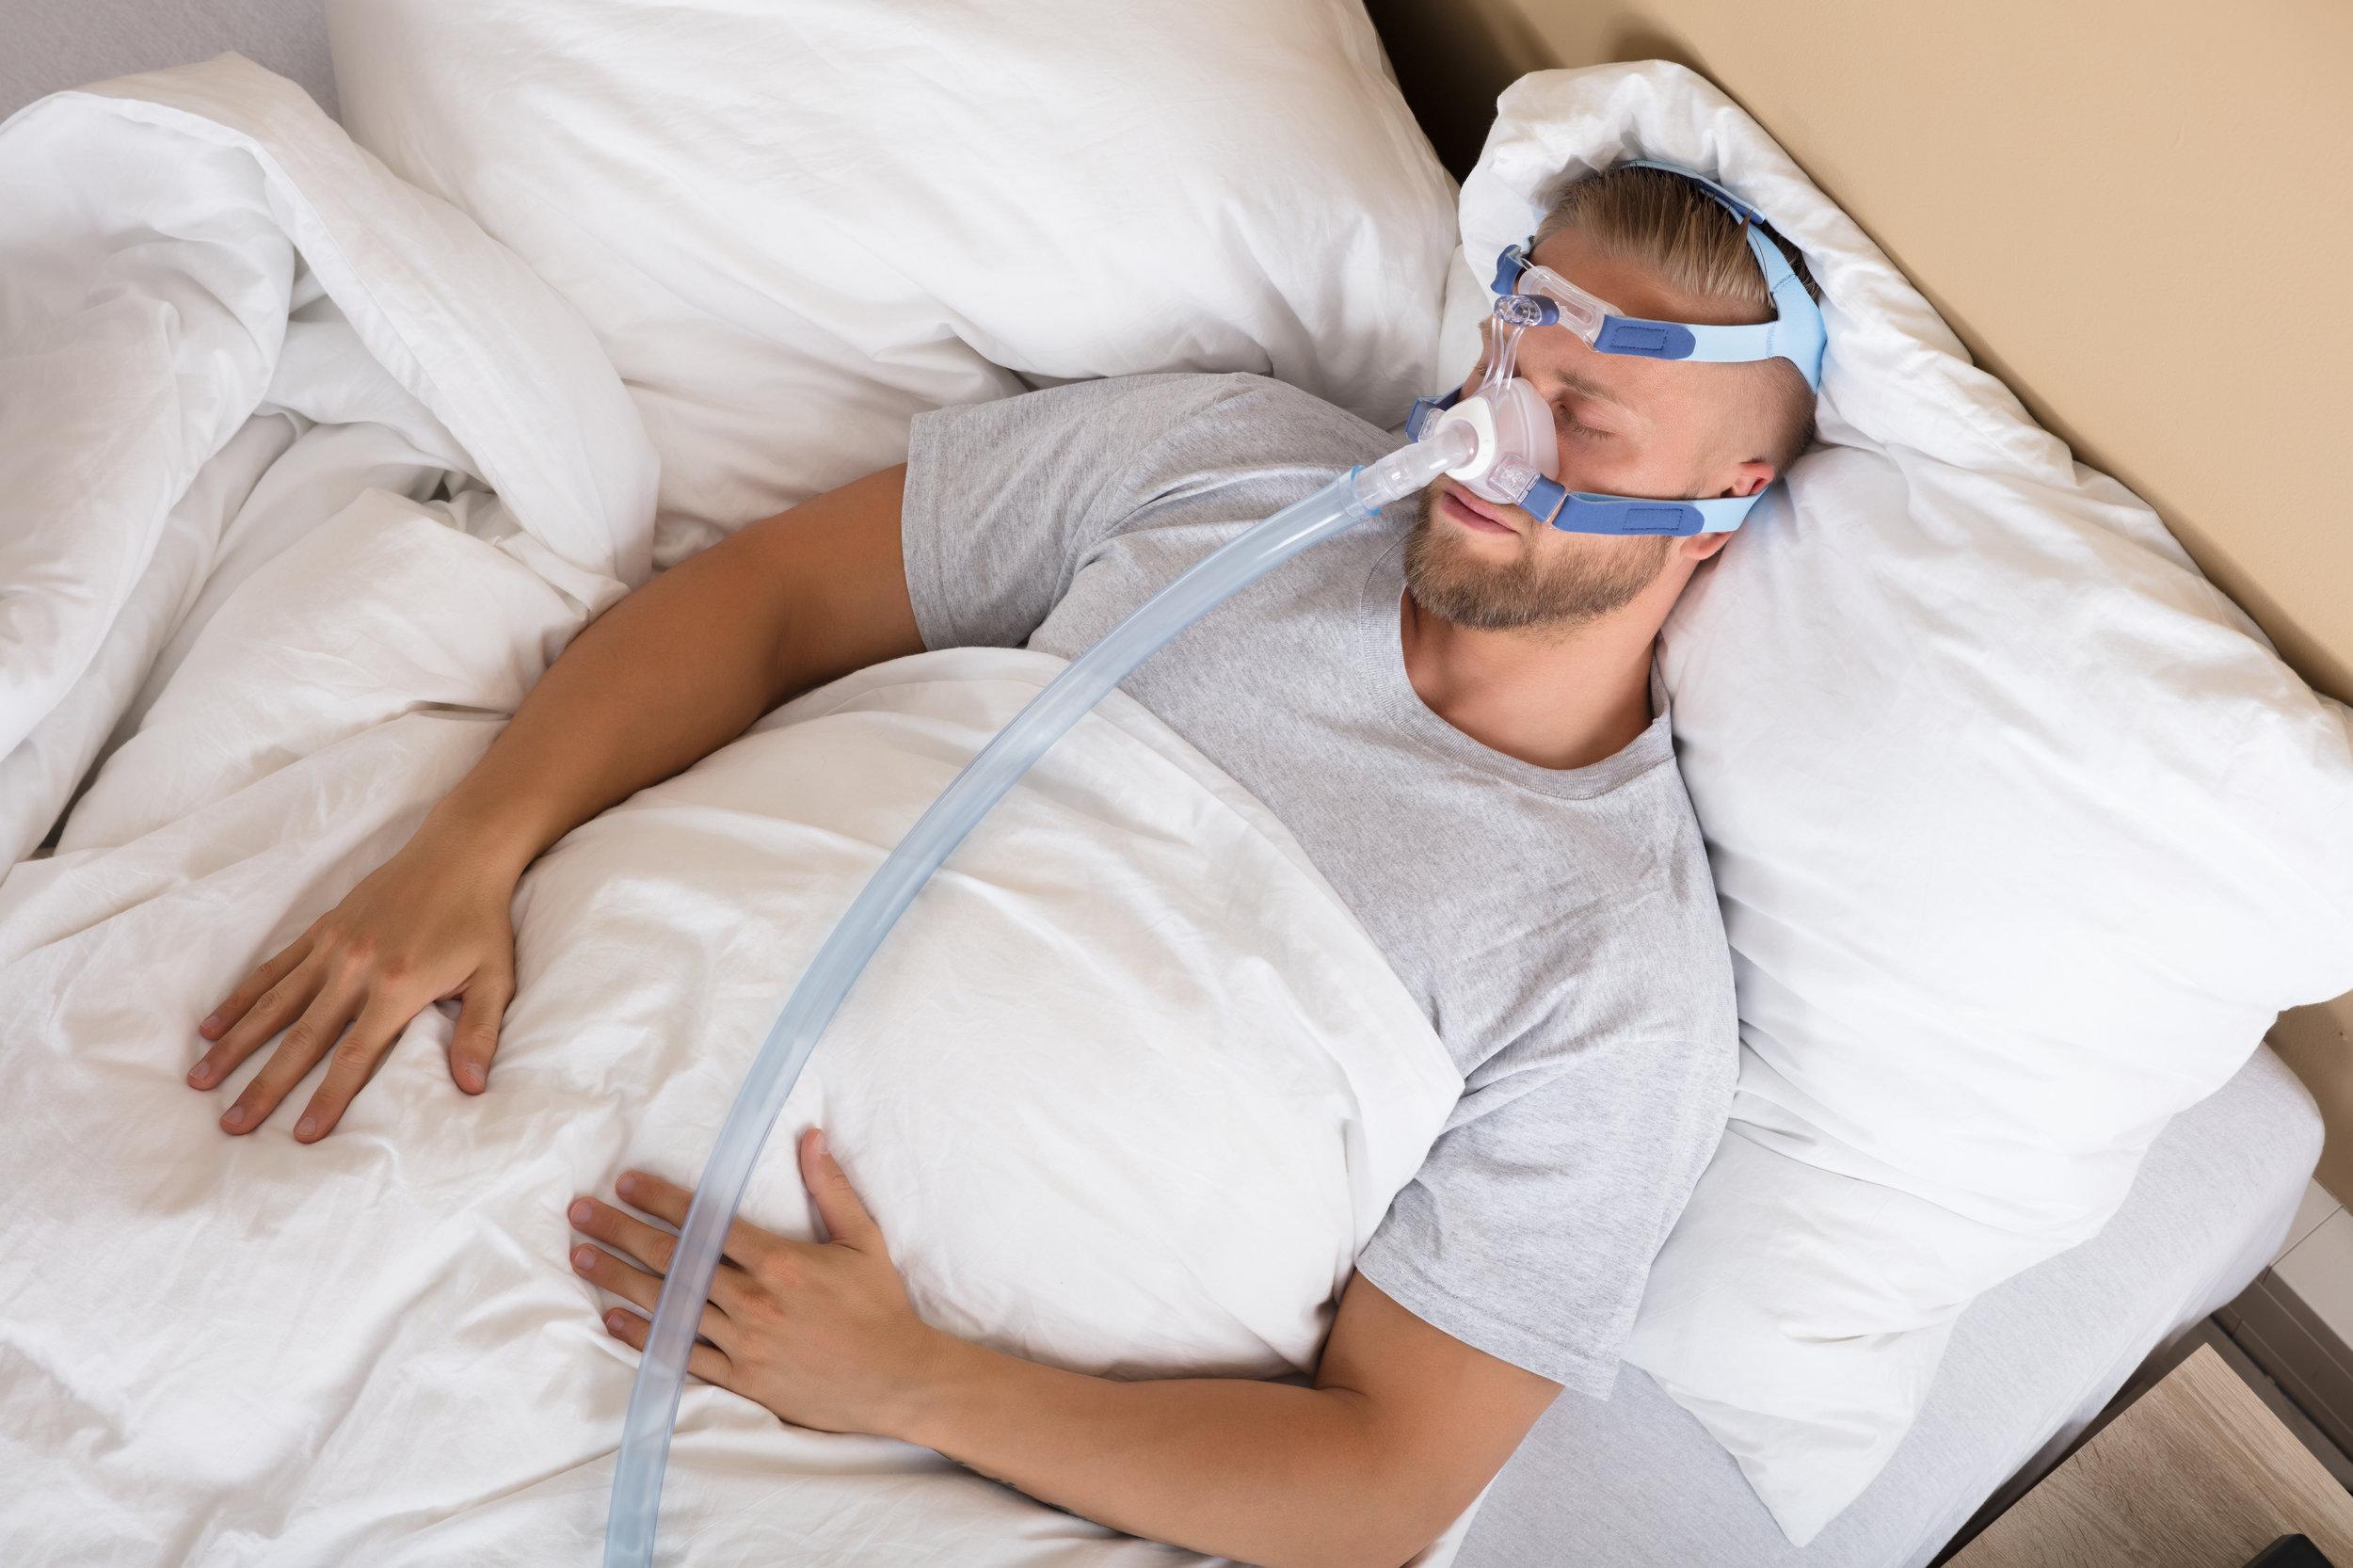 man with cpap machine for sleep apnea